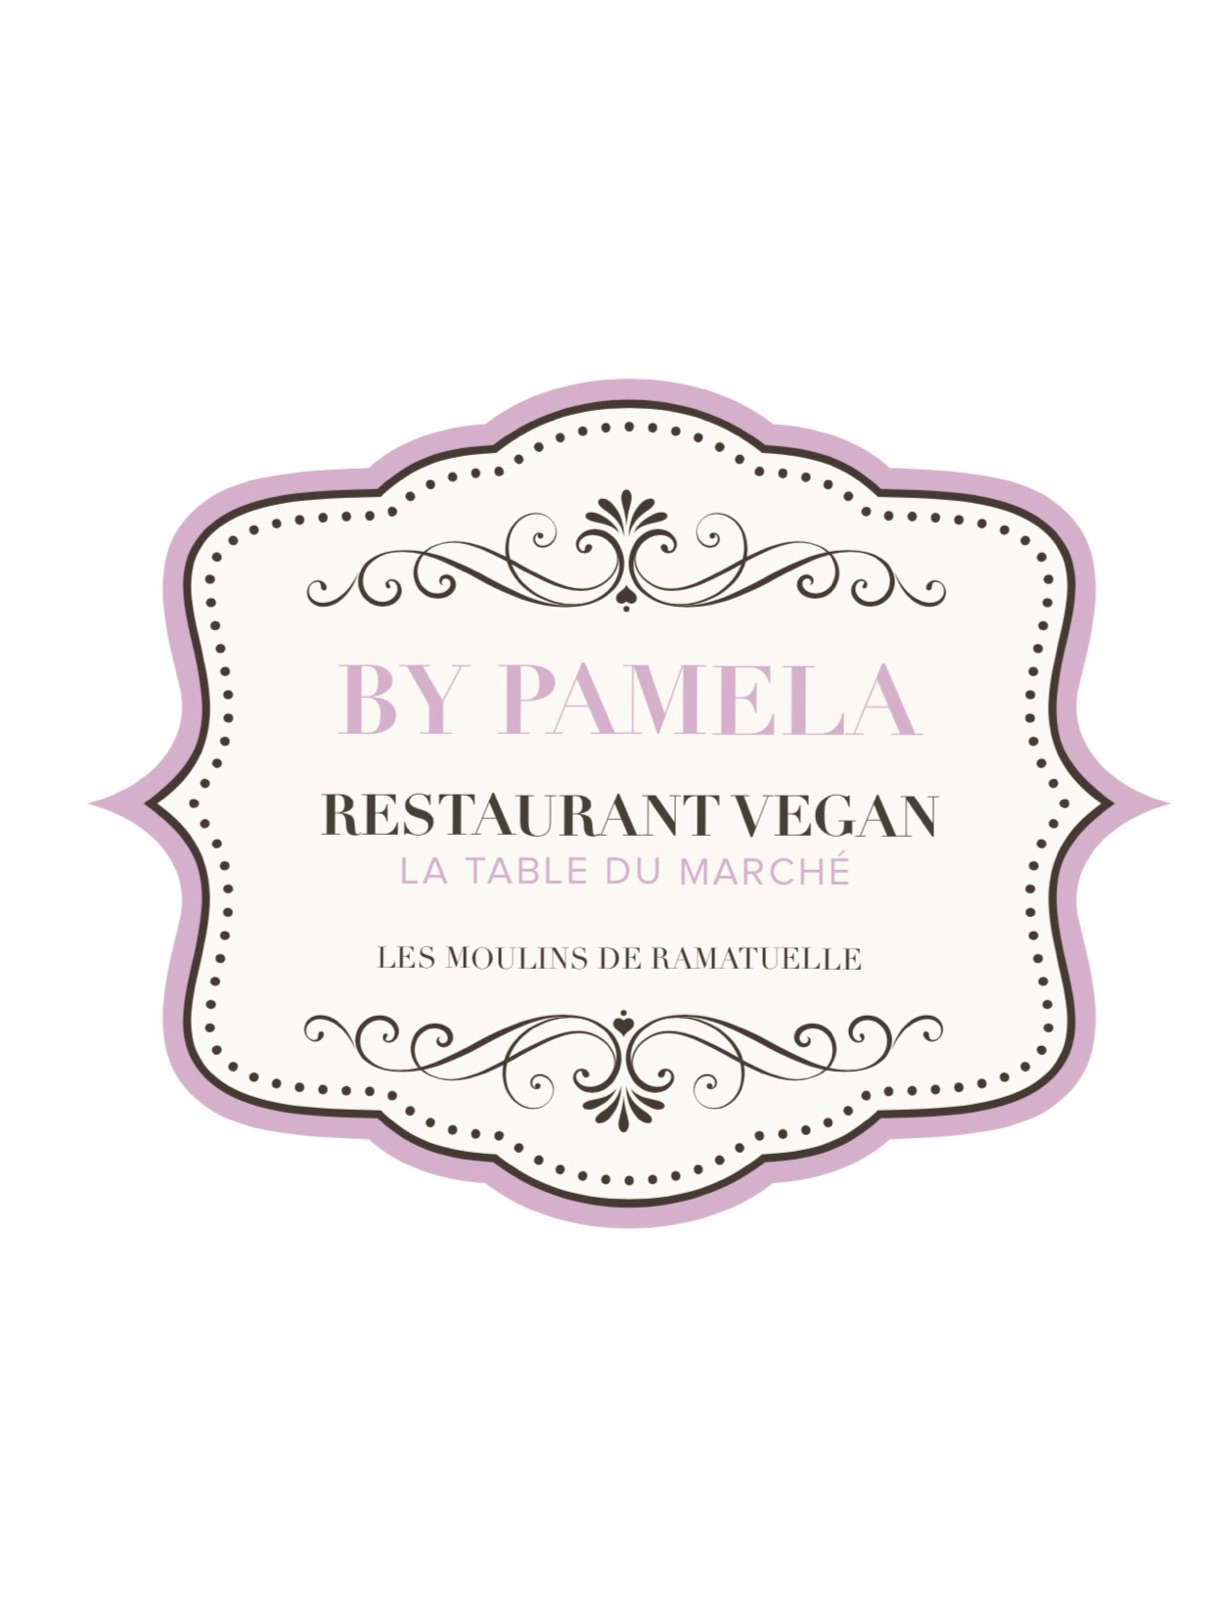 Pamela Anderson ristorante vegano